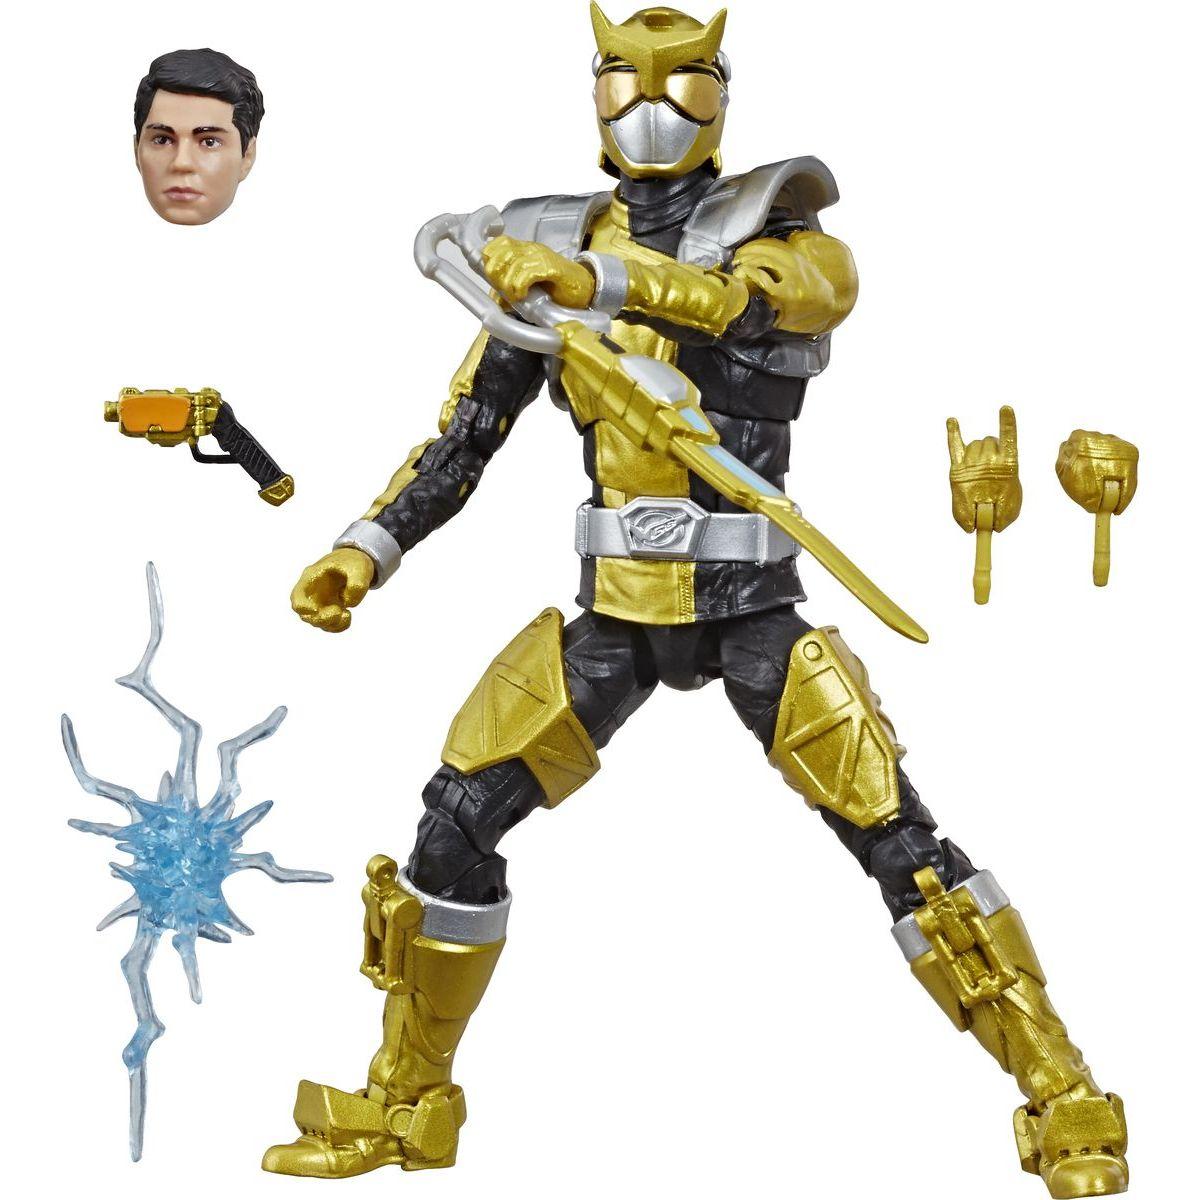 Hasbro Power Rangers 15 cm figurka s výměnnou hlavou Beast Morphers Gold Ranger